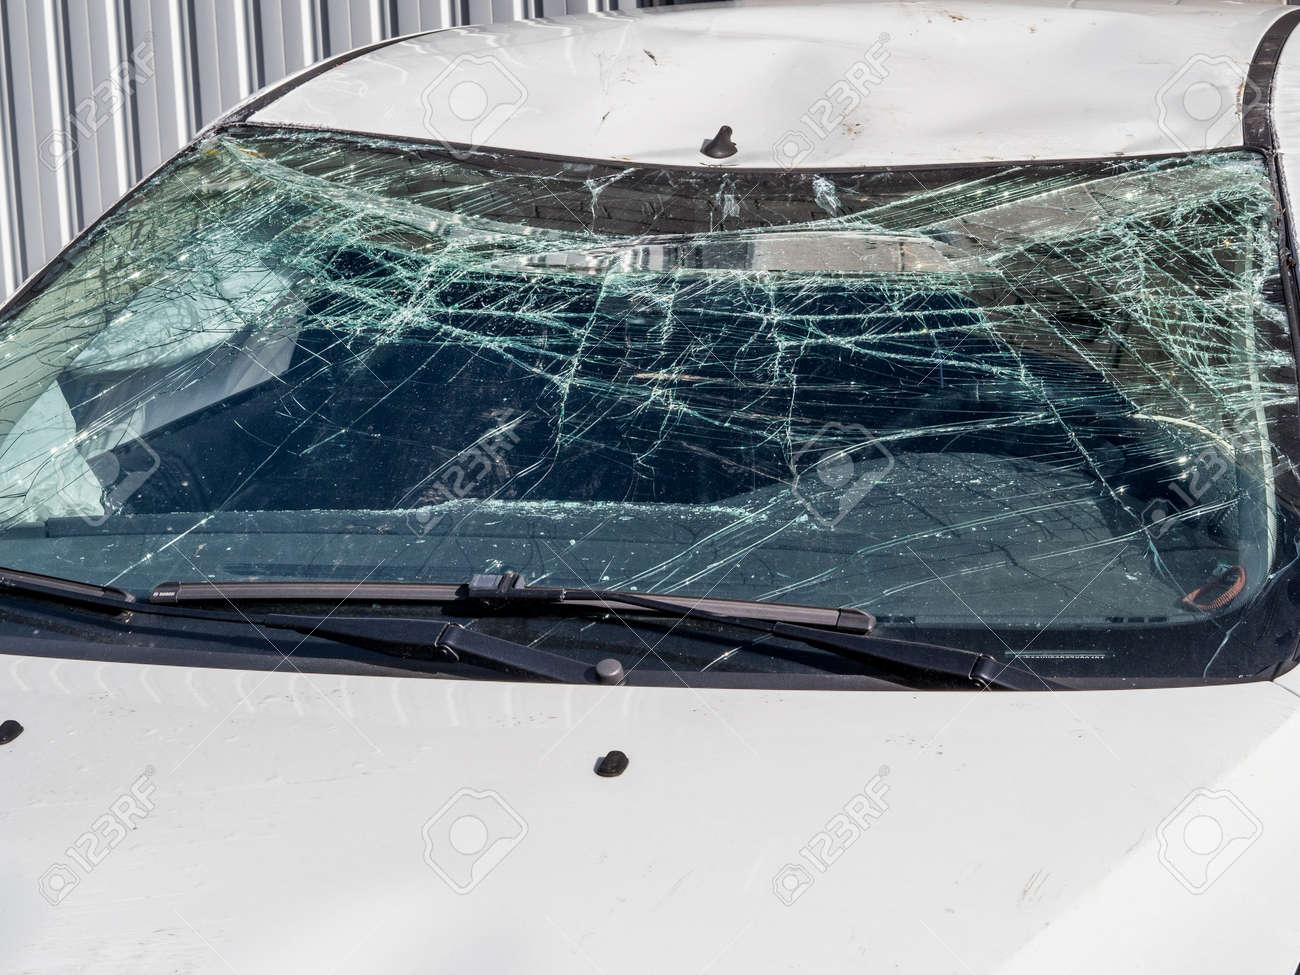 Car with broken windshield - 140458724